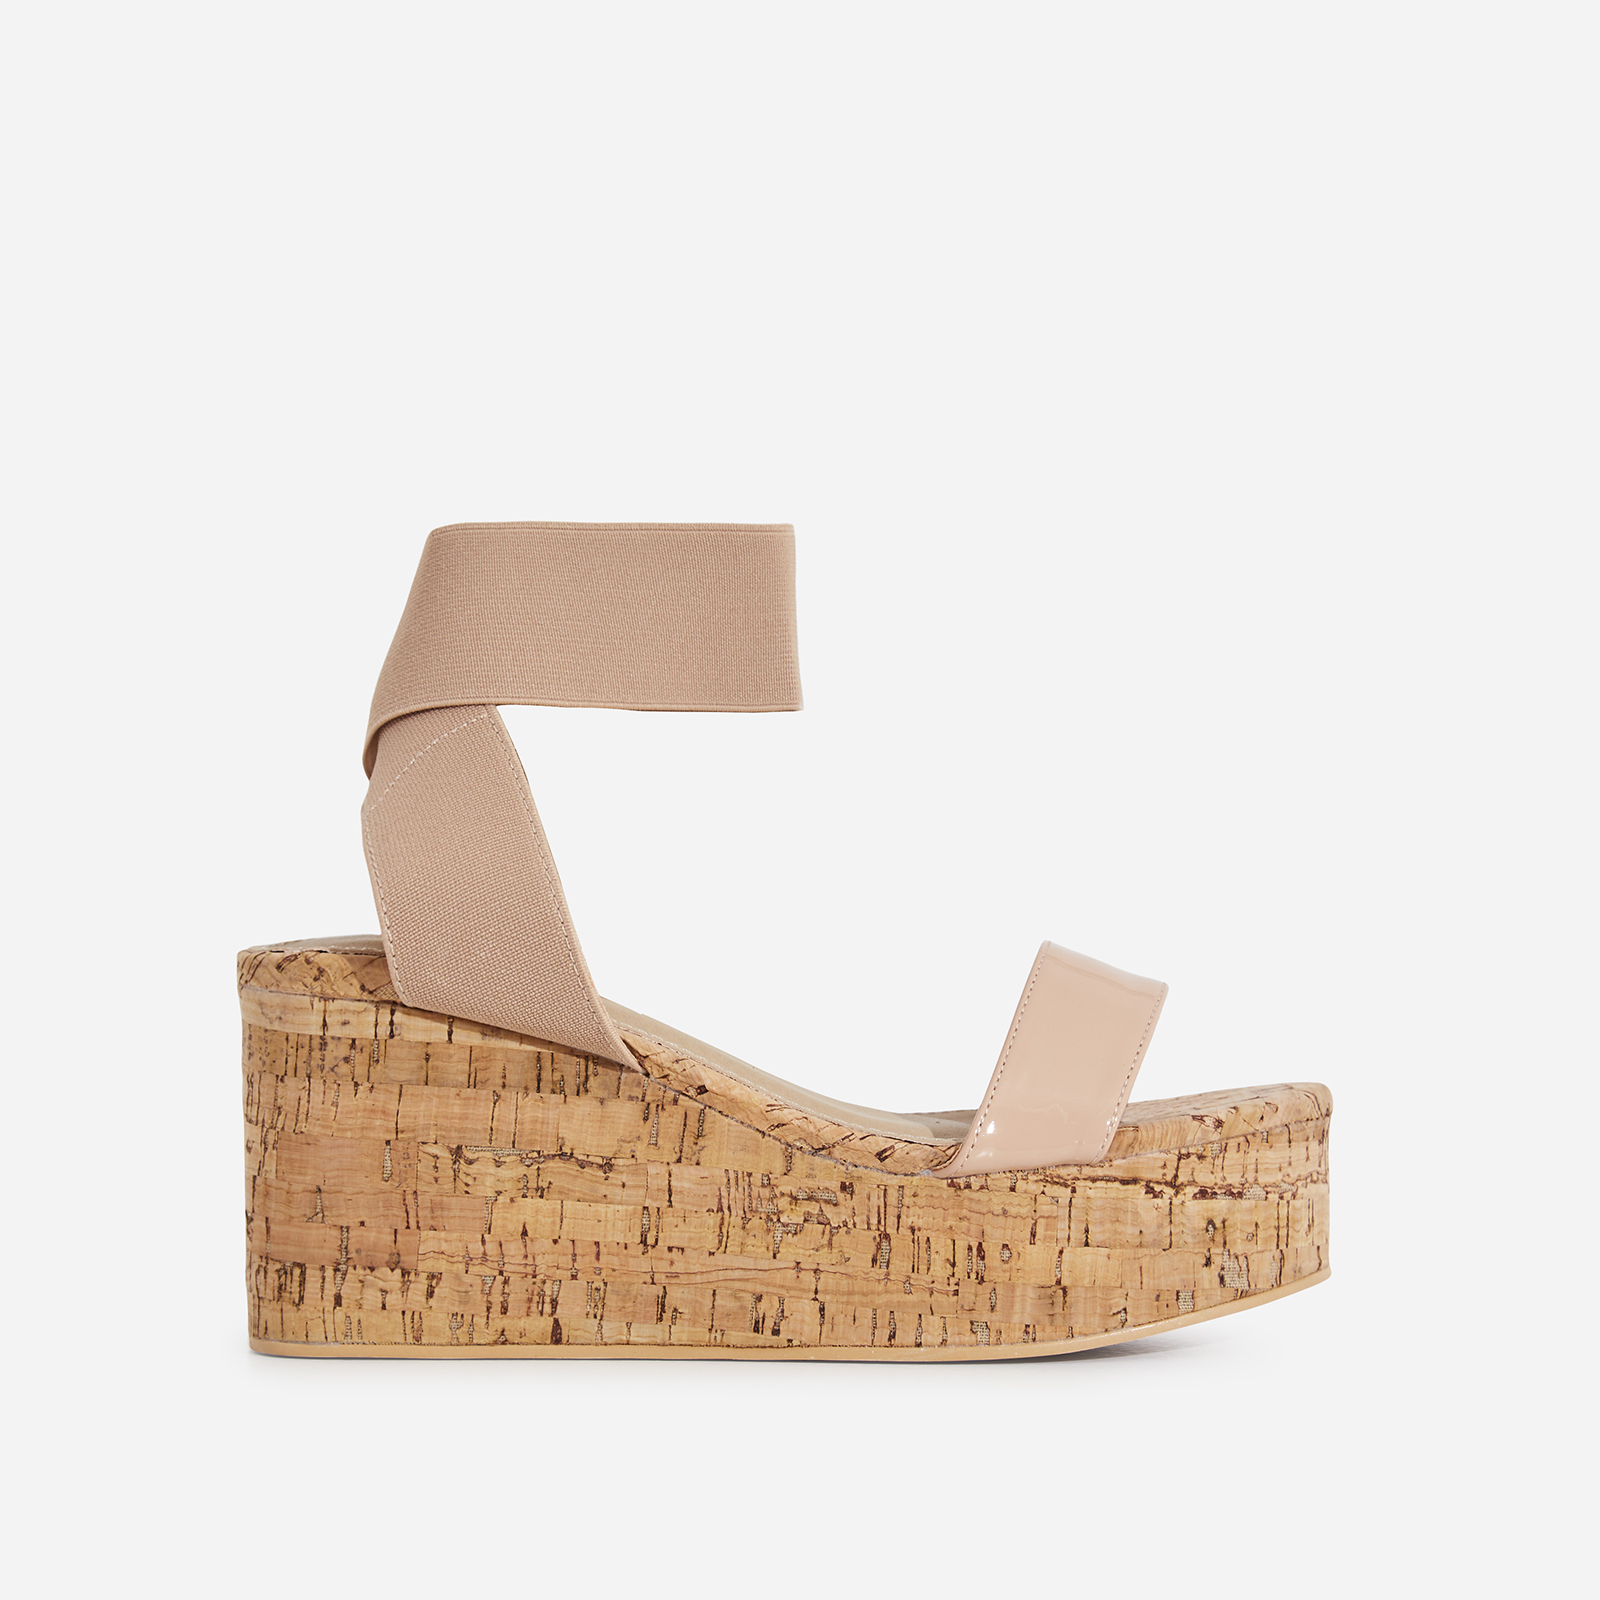 Andie Elasticated Wedge Sandal In Blush Pink Patent